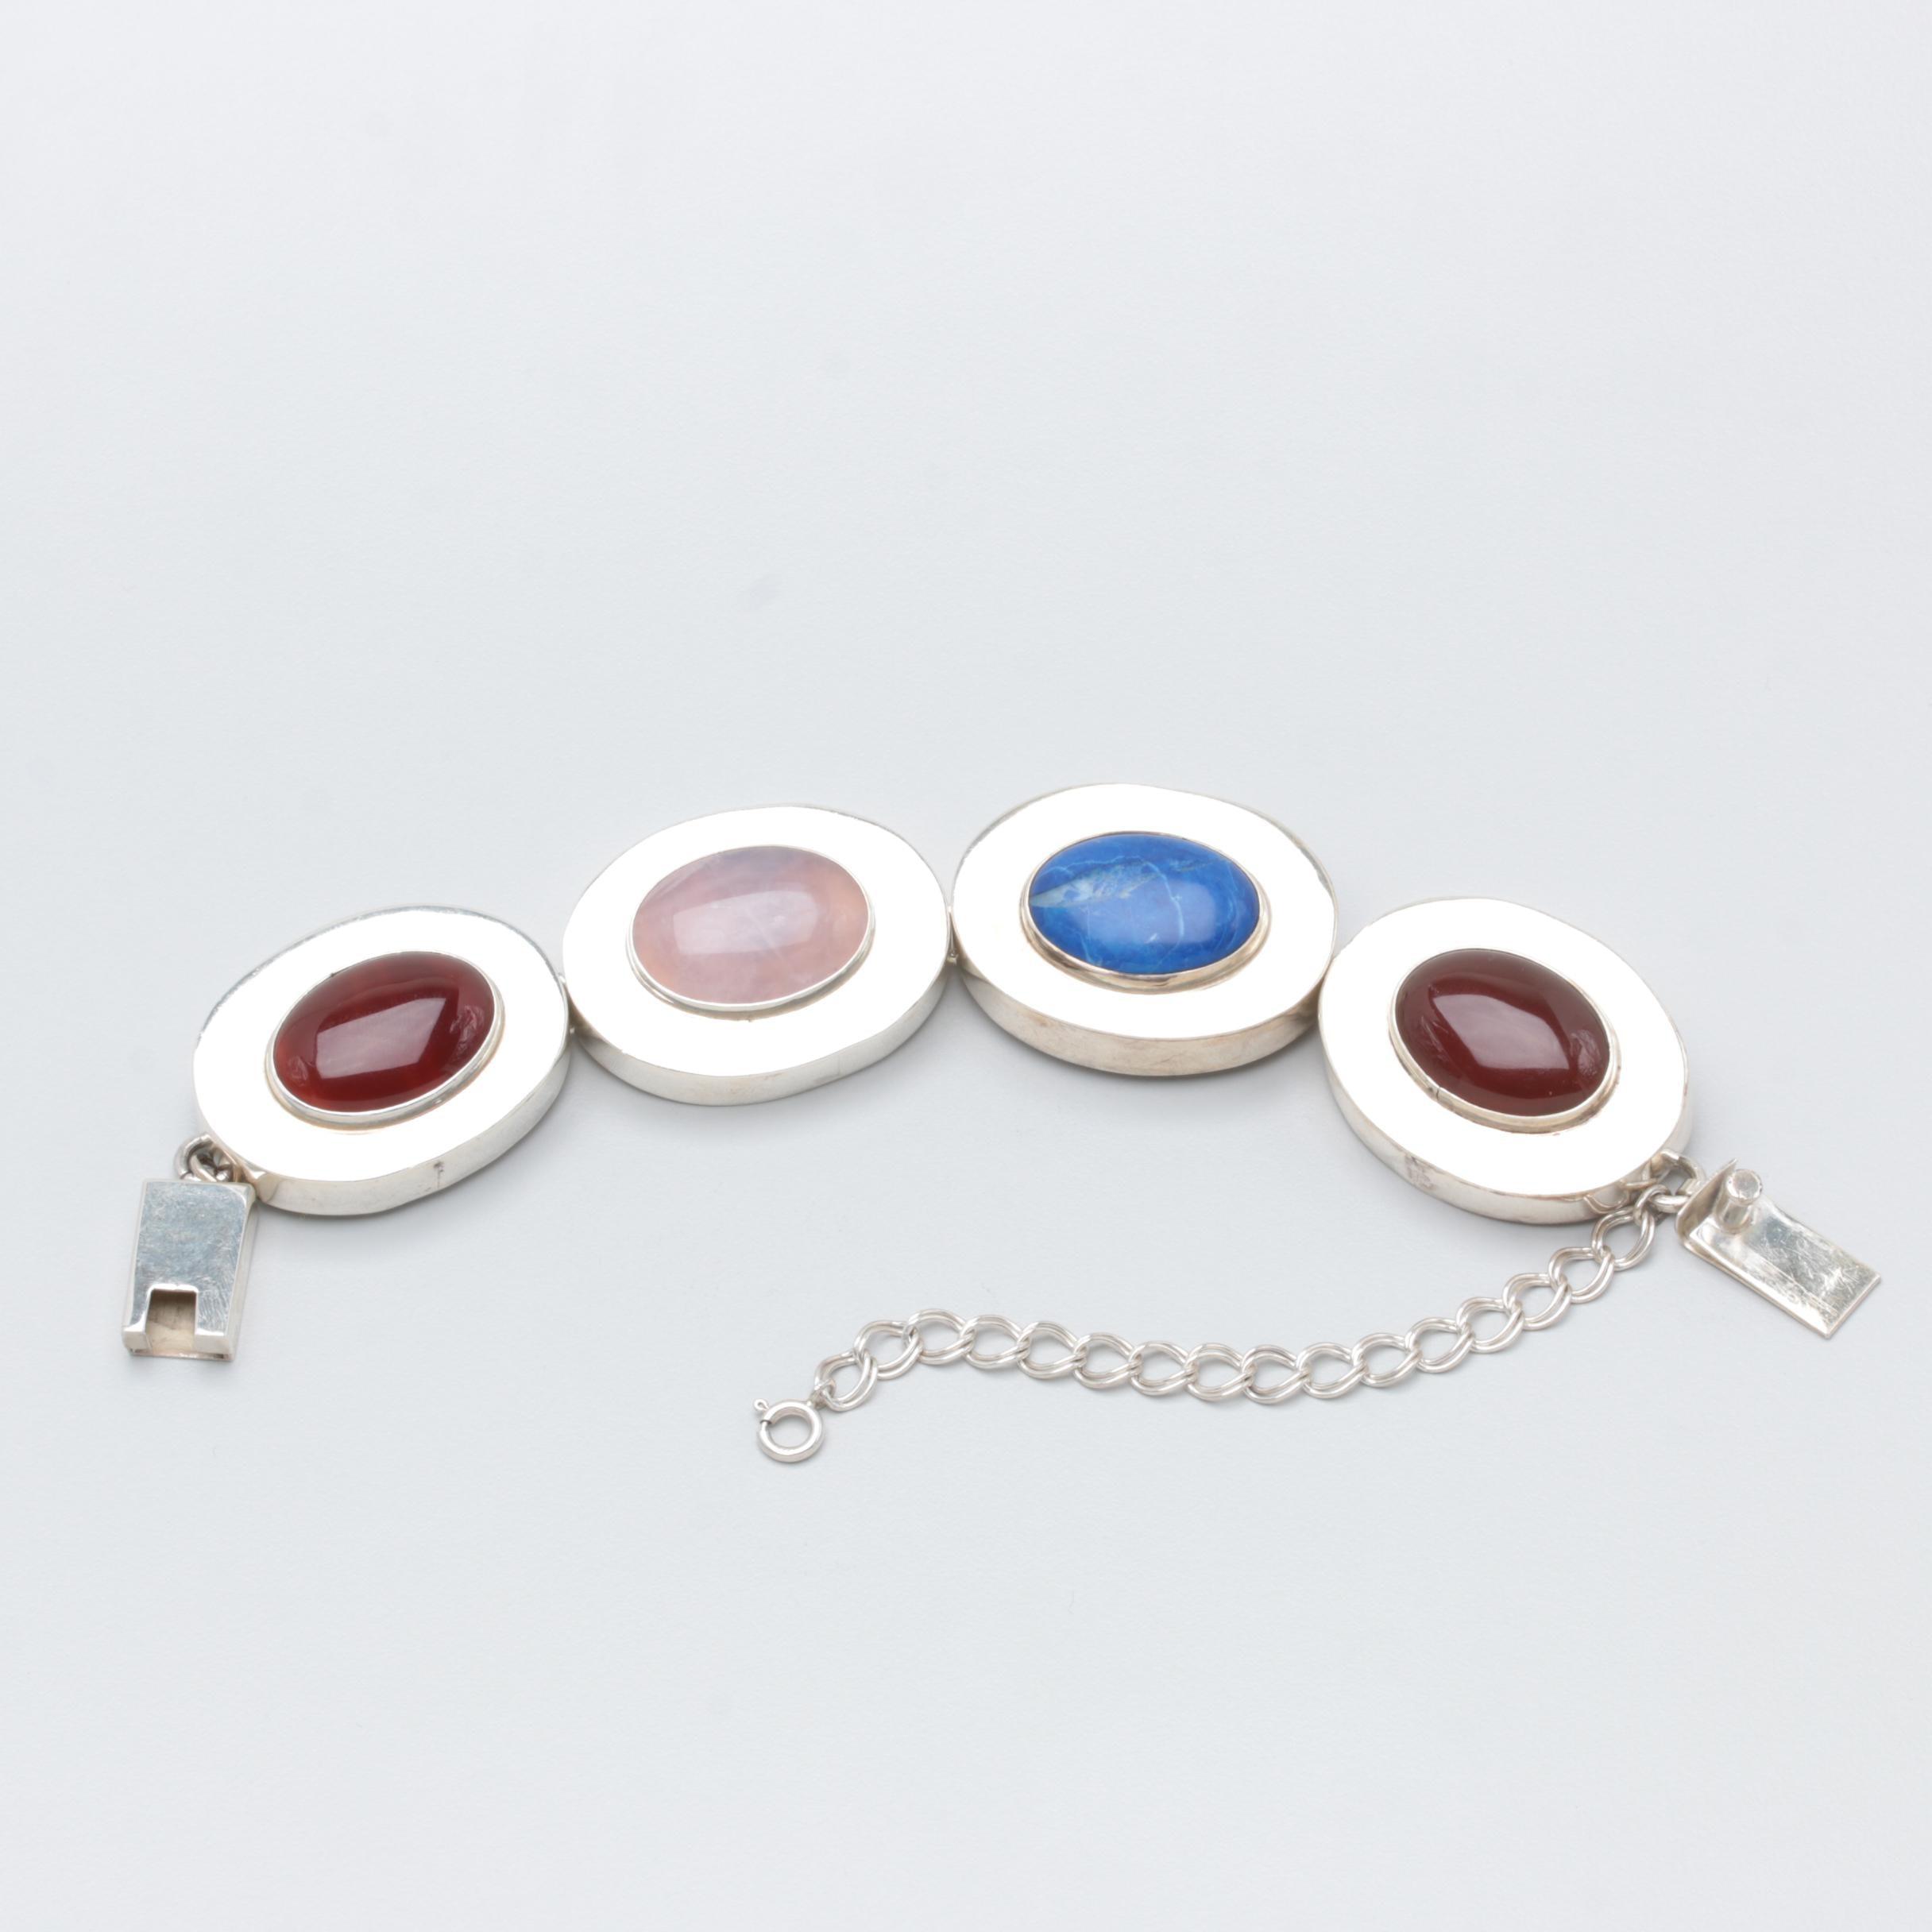 Brenda Schoenfeld Mexican Sterling Rose Quartz, Carnelian and Quartzite Bracelet